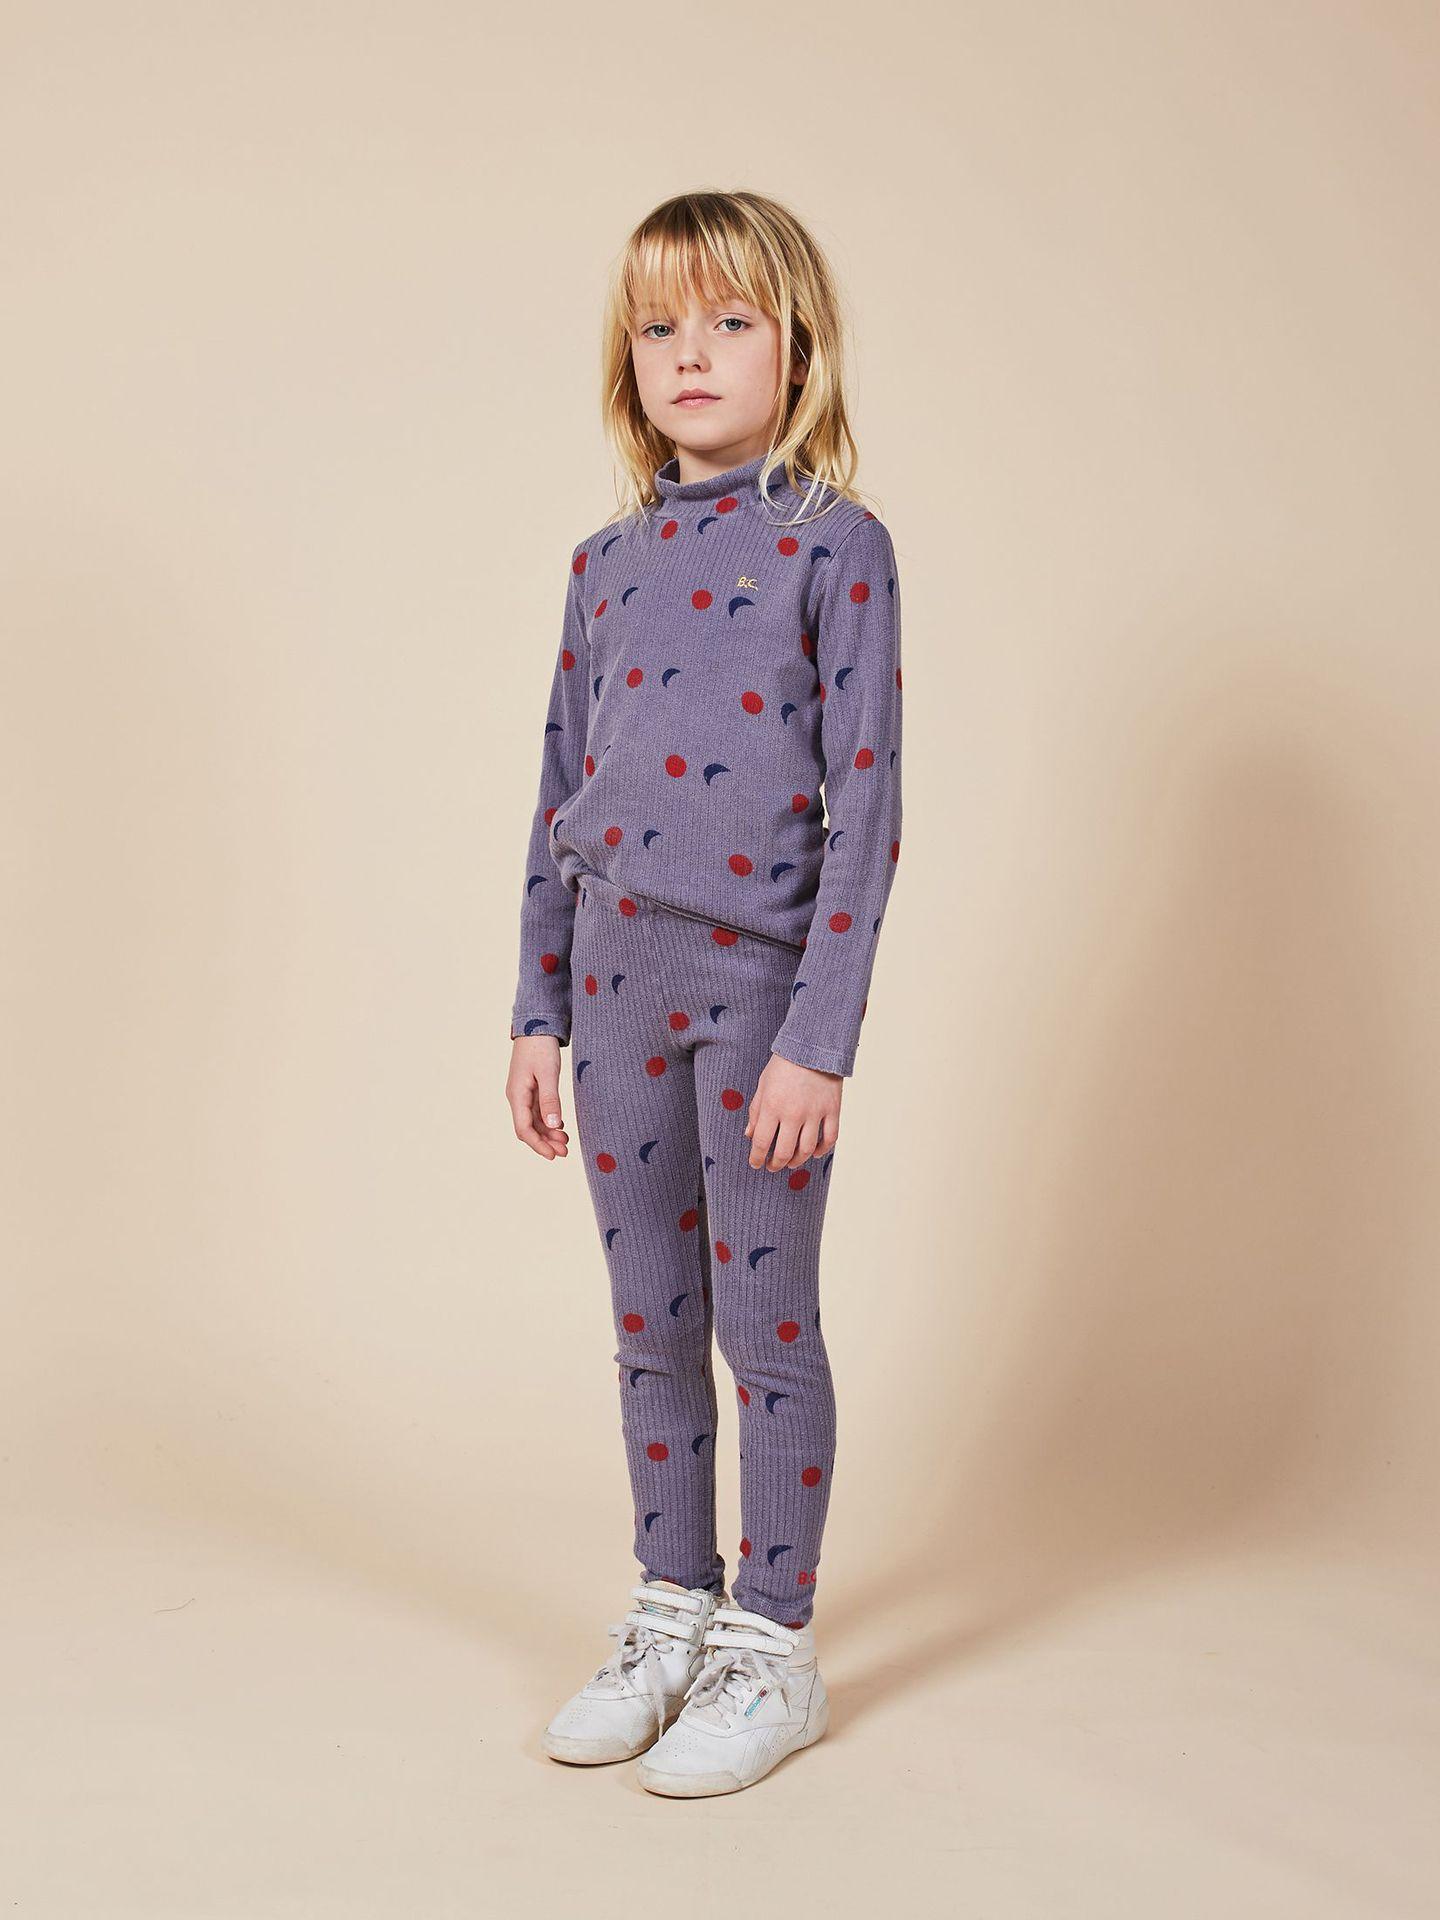 2020 Autumn Winter Girls Clothing Sets Pajama Sets Kids Clothes Vestidos  Long Sleeved T shirts+ Leggings Christmas Clothing 3